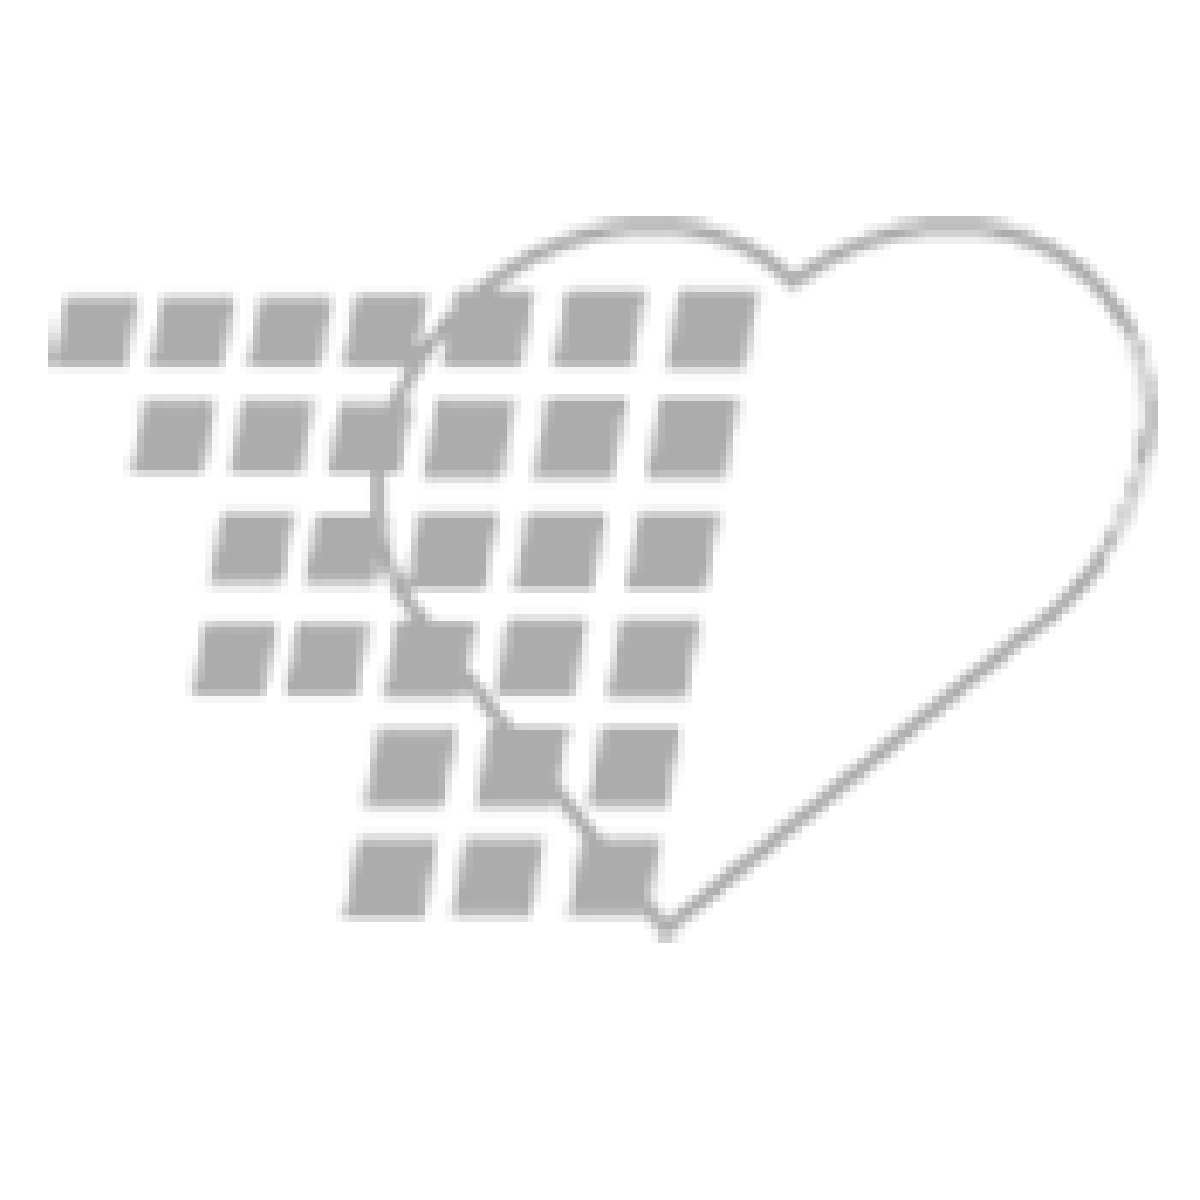 02-33-6440 - Detecto® Solo Digital Eye-Level Physician Scale